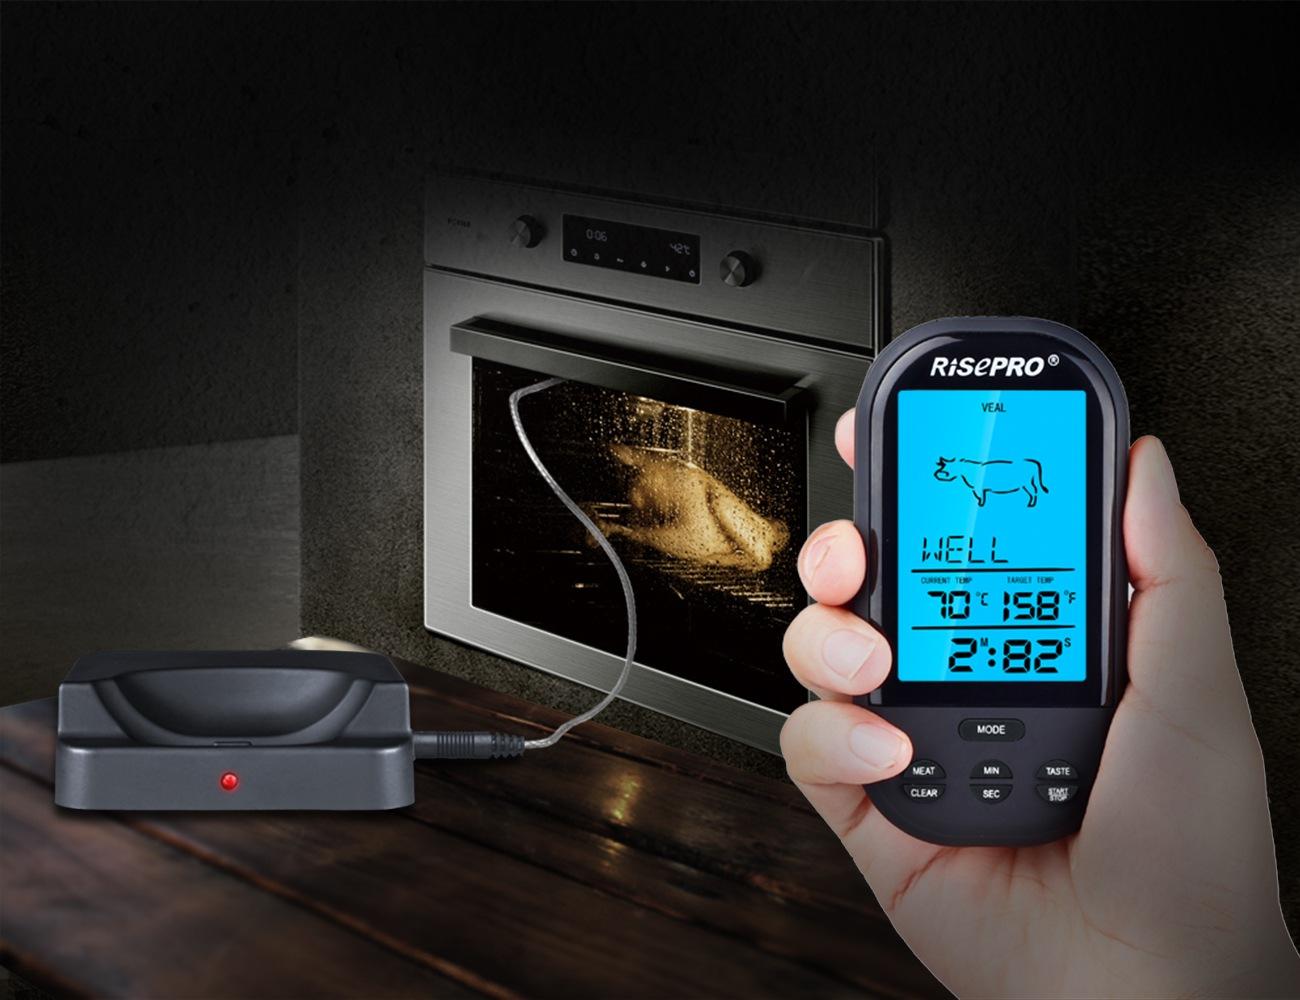 RISEPRO – Wireless Food Thermometer